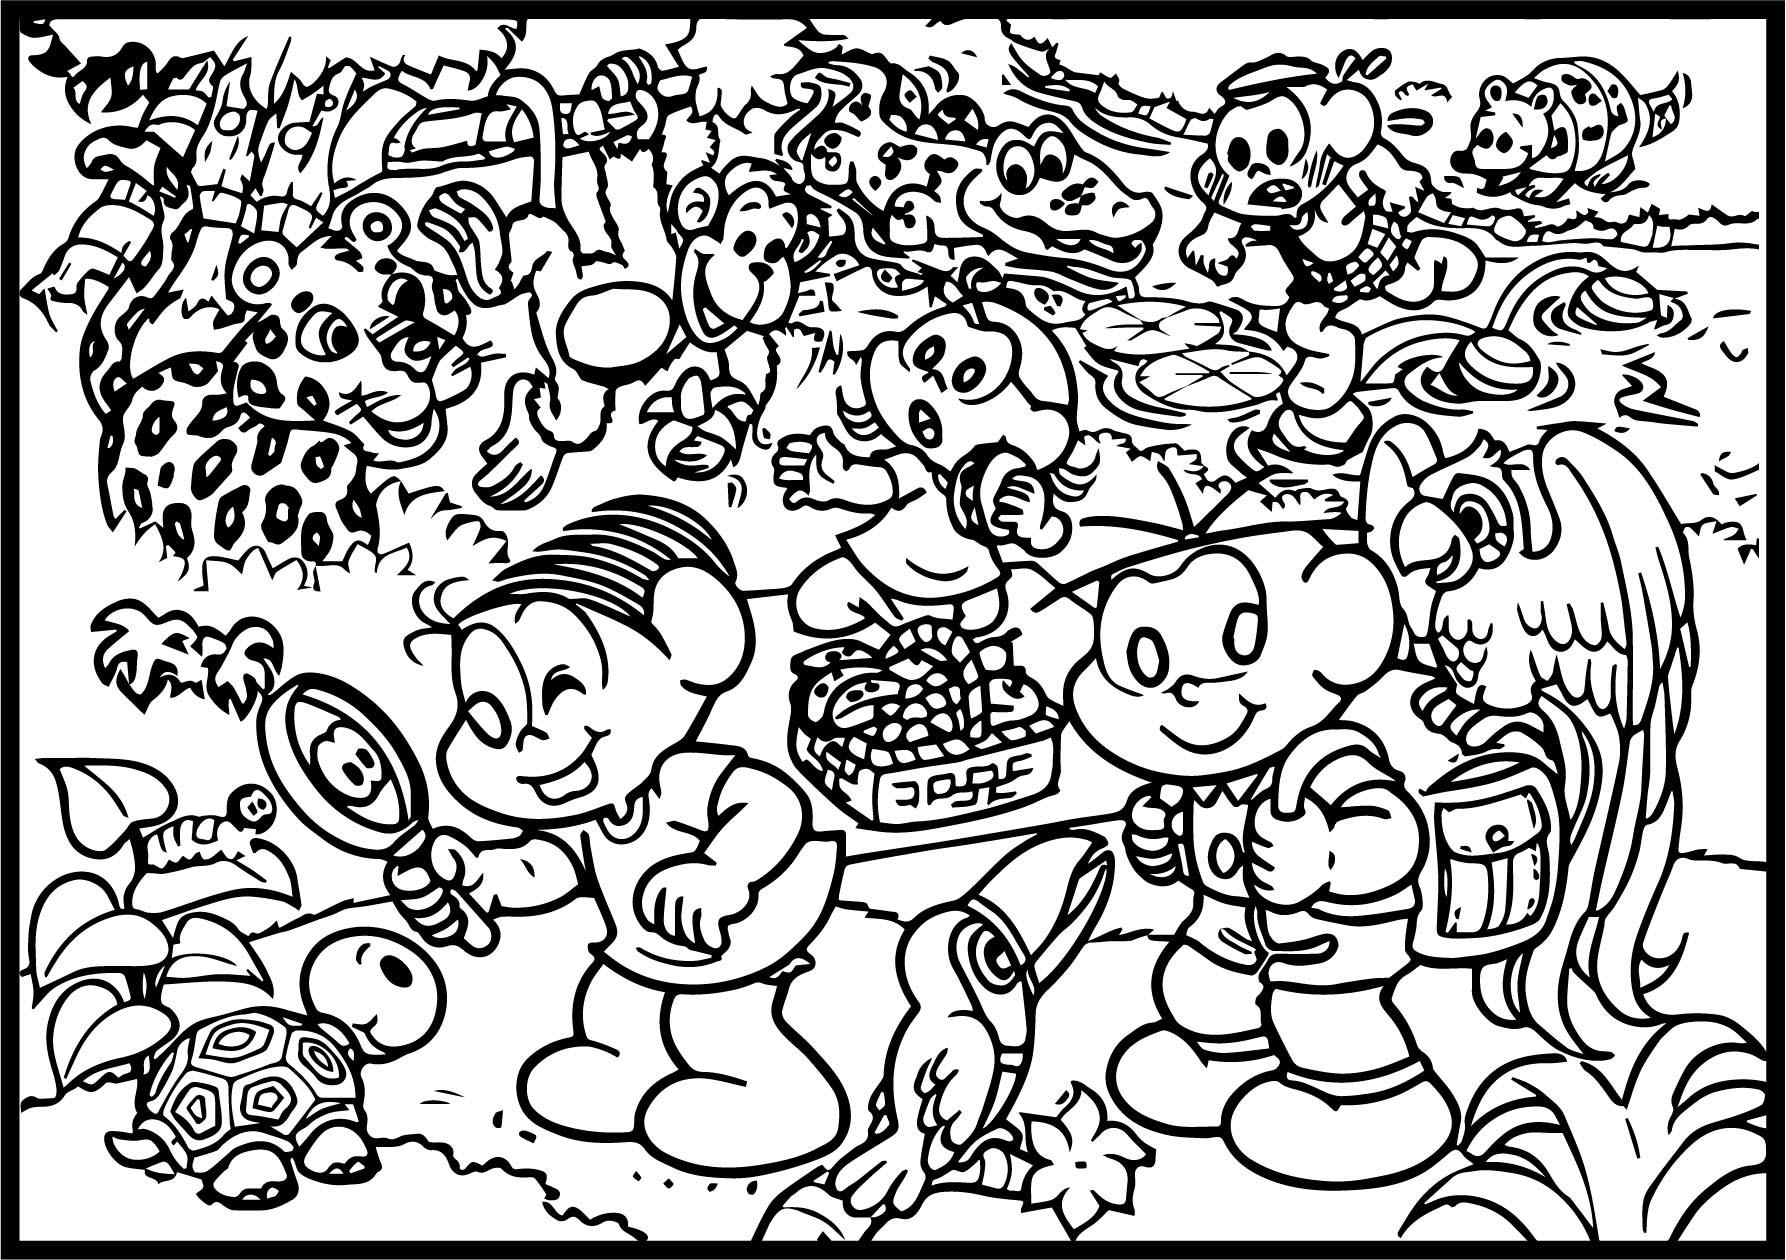 Turma Da Monica Friends And Animals Coloring Page